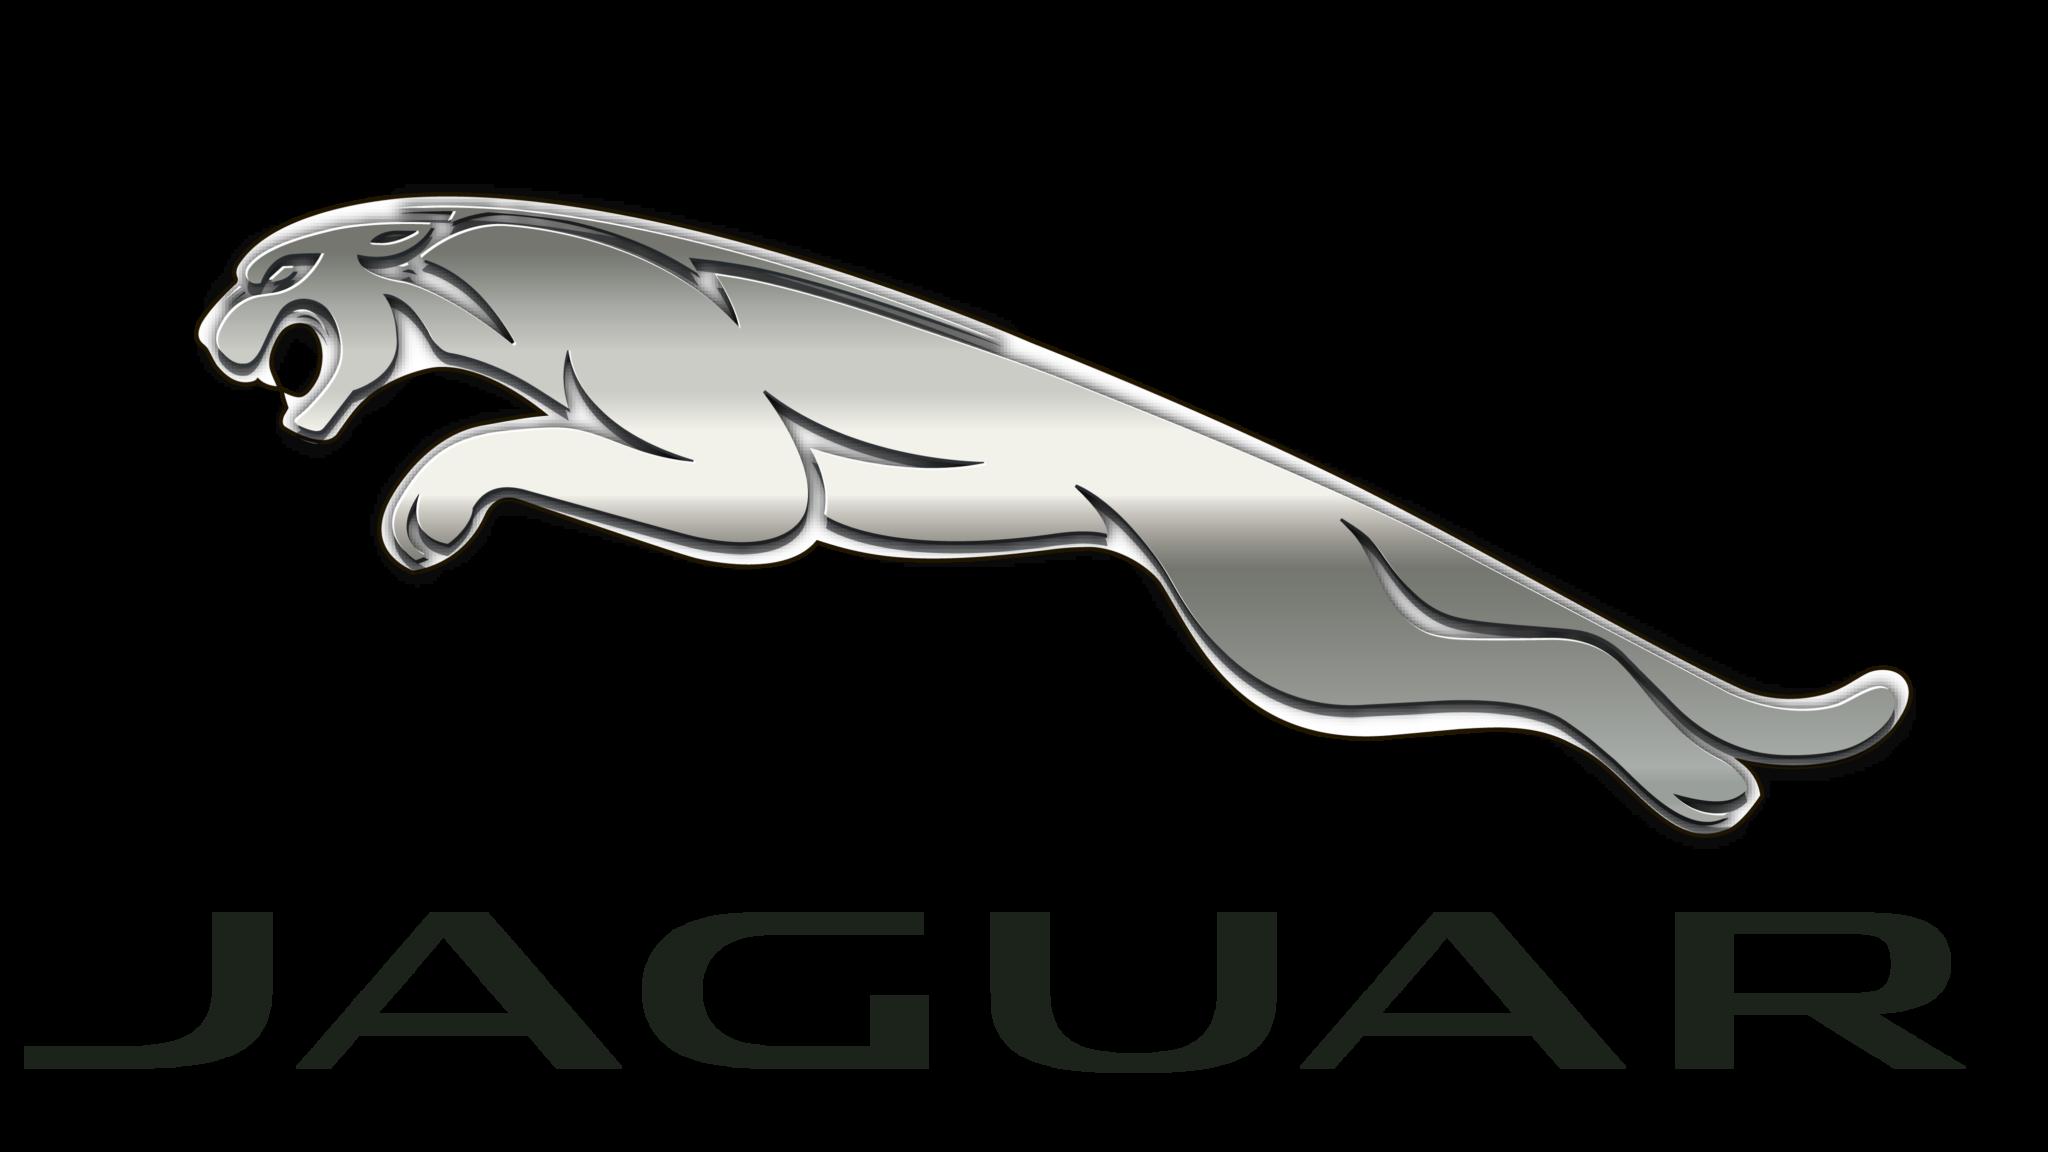 jaguar логотип